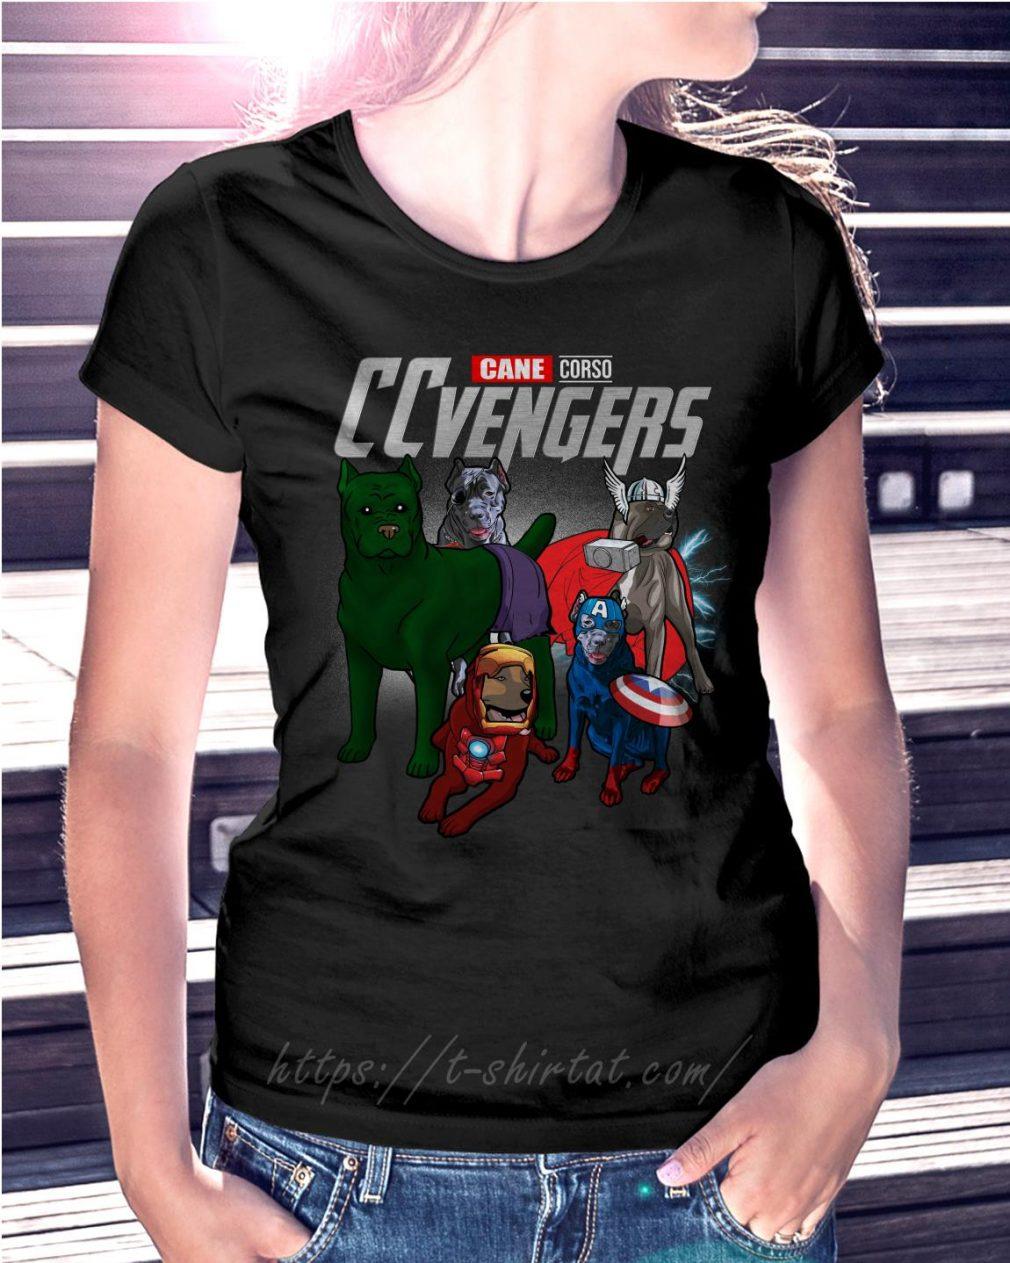 Marvel Cane Corso CCvengers